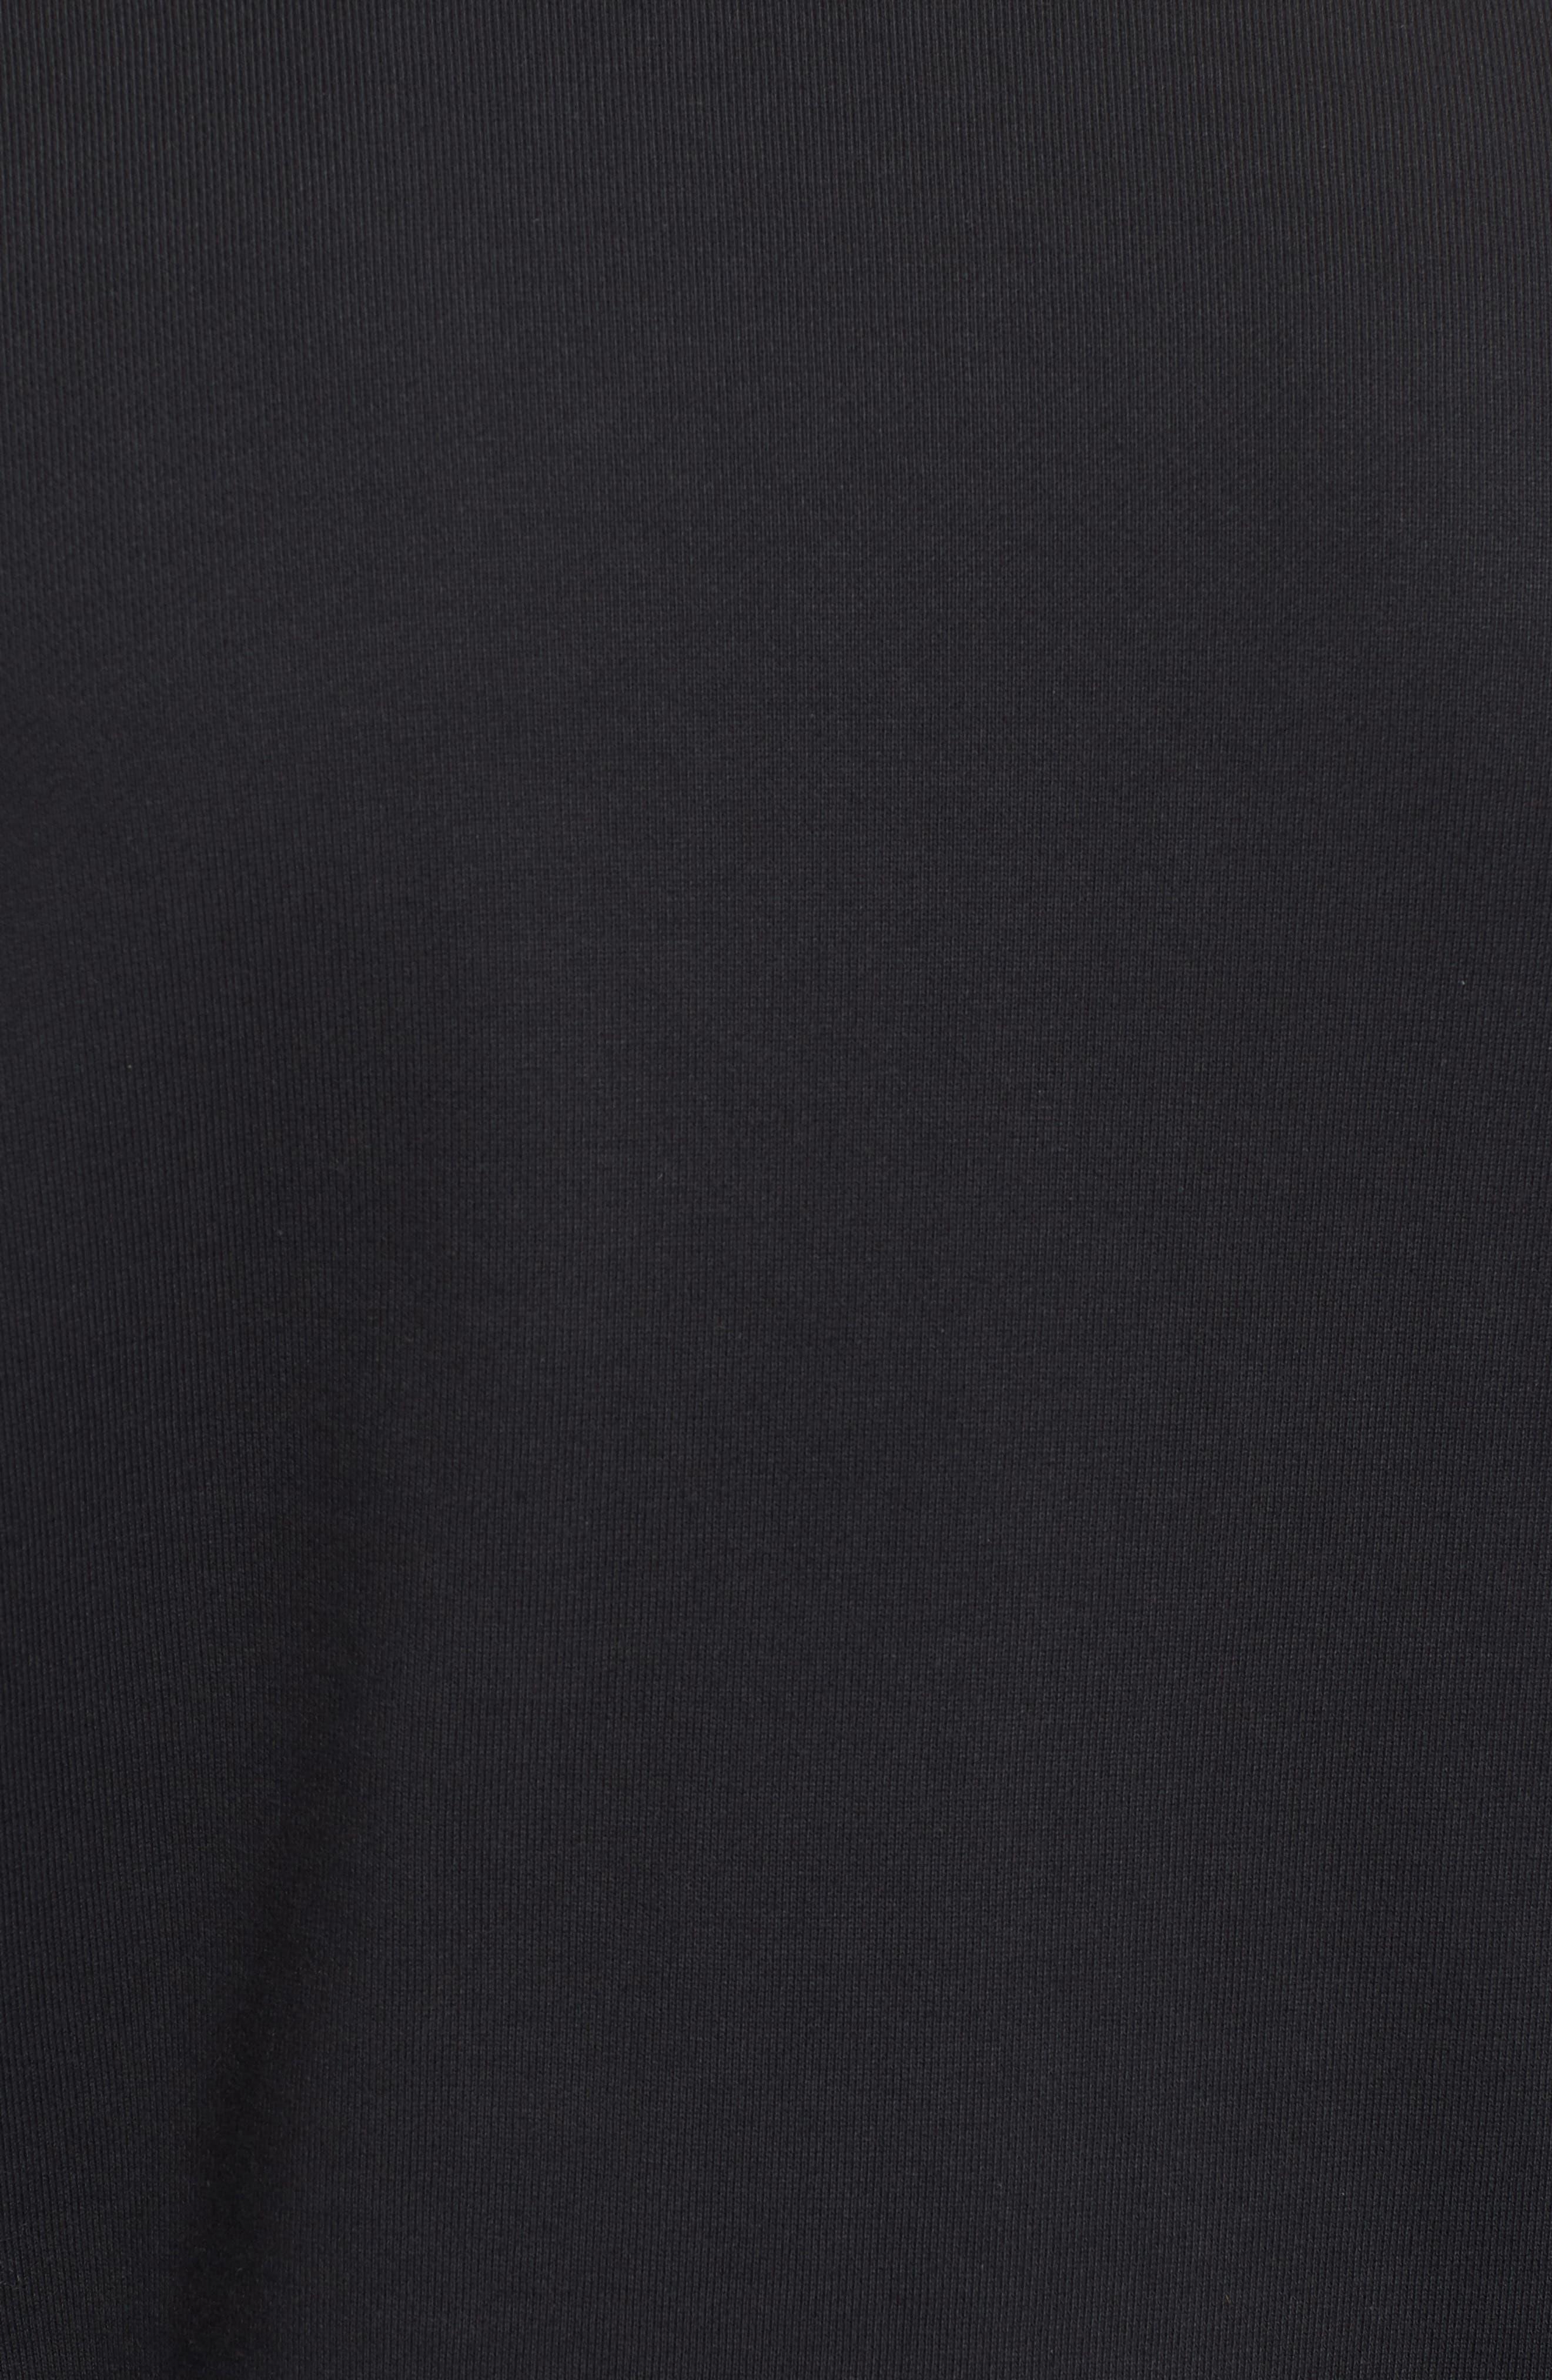 NSW Air Max Crewneck Sweatshirt,                             Alternate thumbnail 5, color,                             Black/ Black/ Black